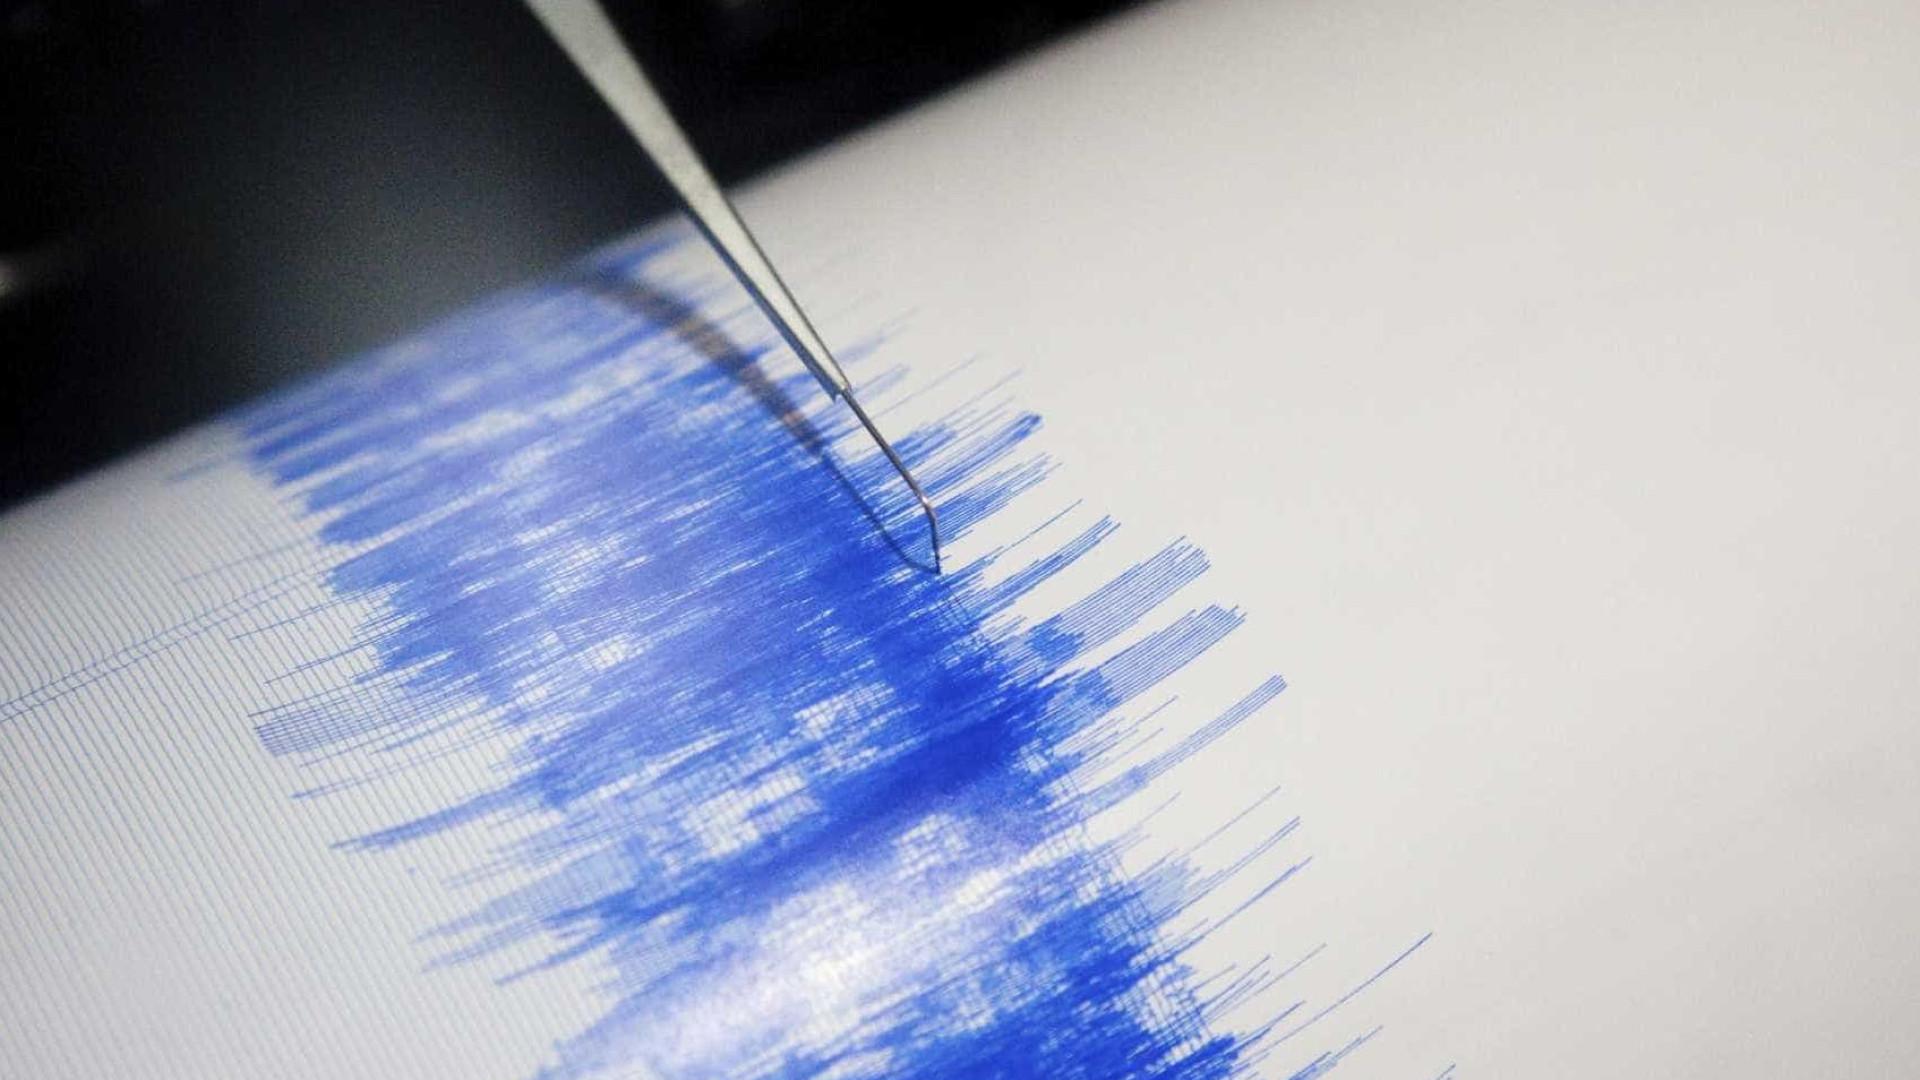 Terremoto de 7,5 atinge leste das ilhas Curilas na Rússia